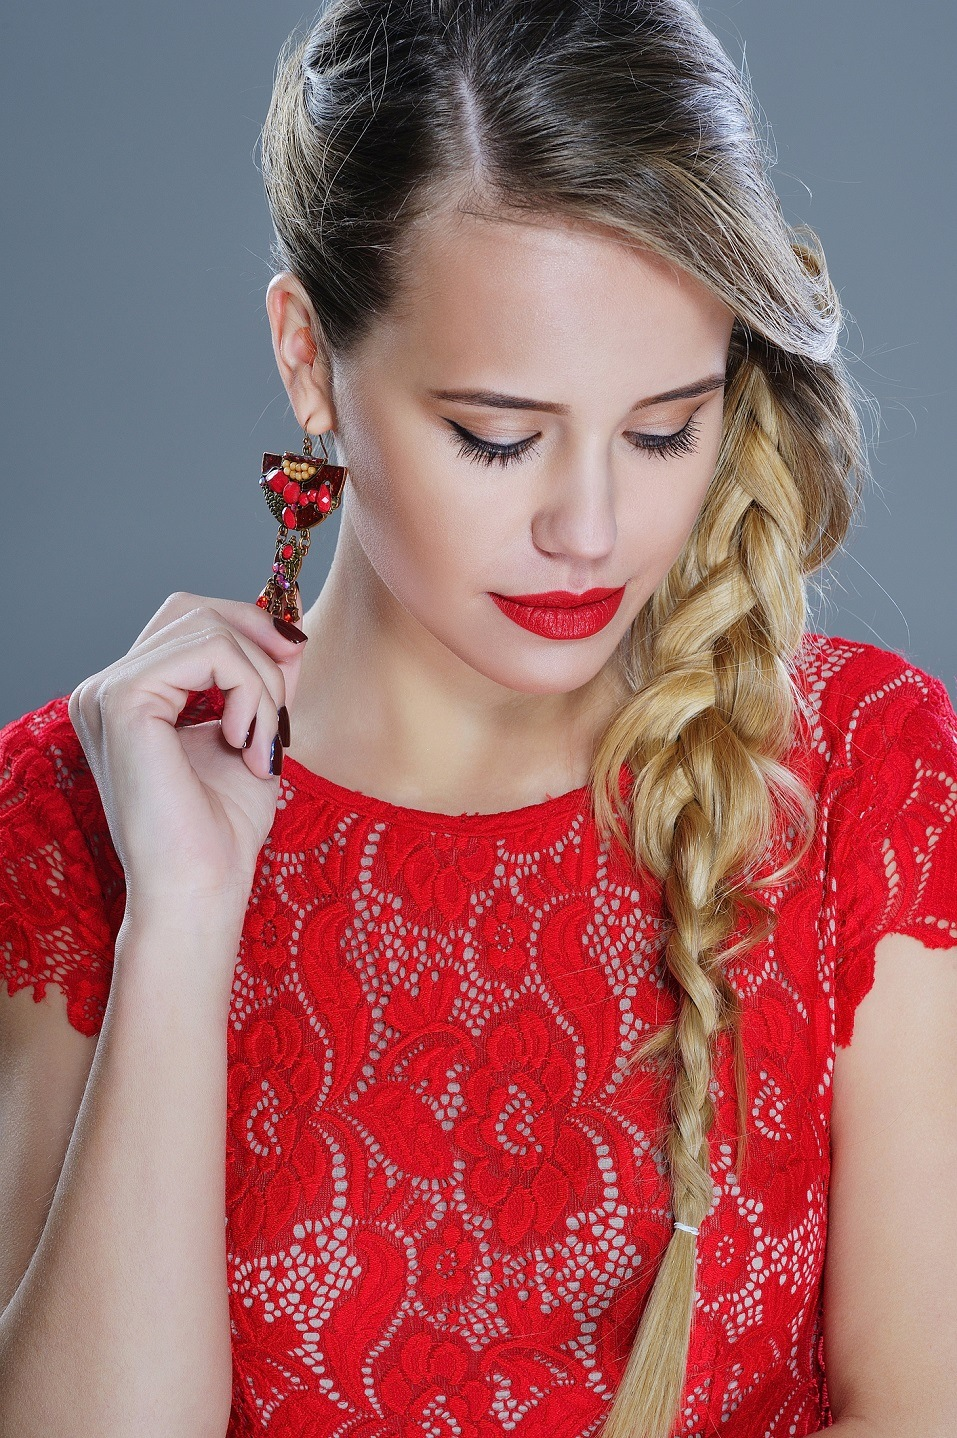 Fashion woman closeup portrait with red lipstick